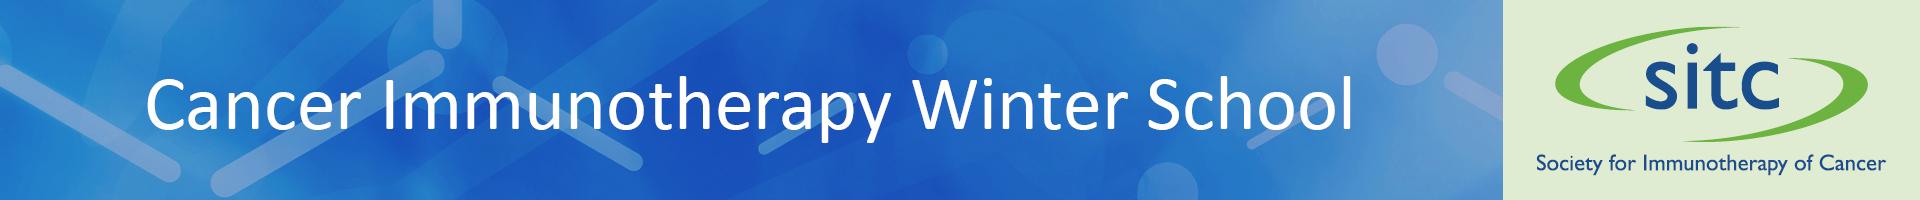 Cancer Immunotherapy Winter School  Event Banner